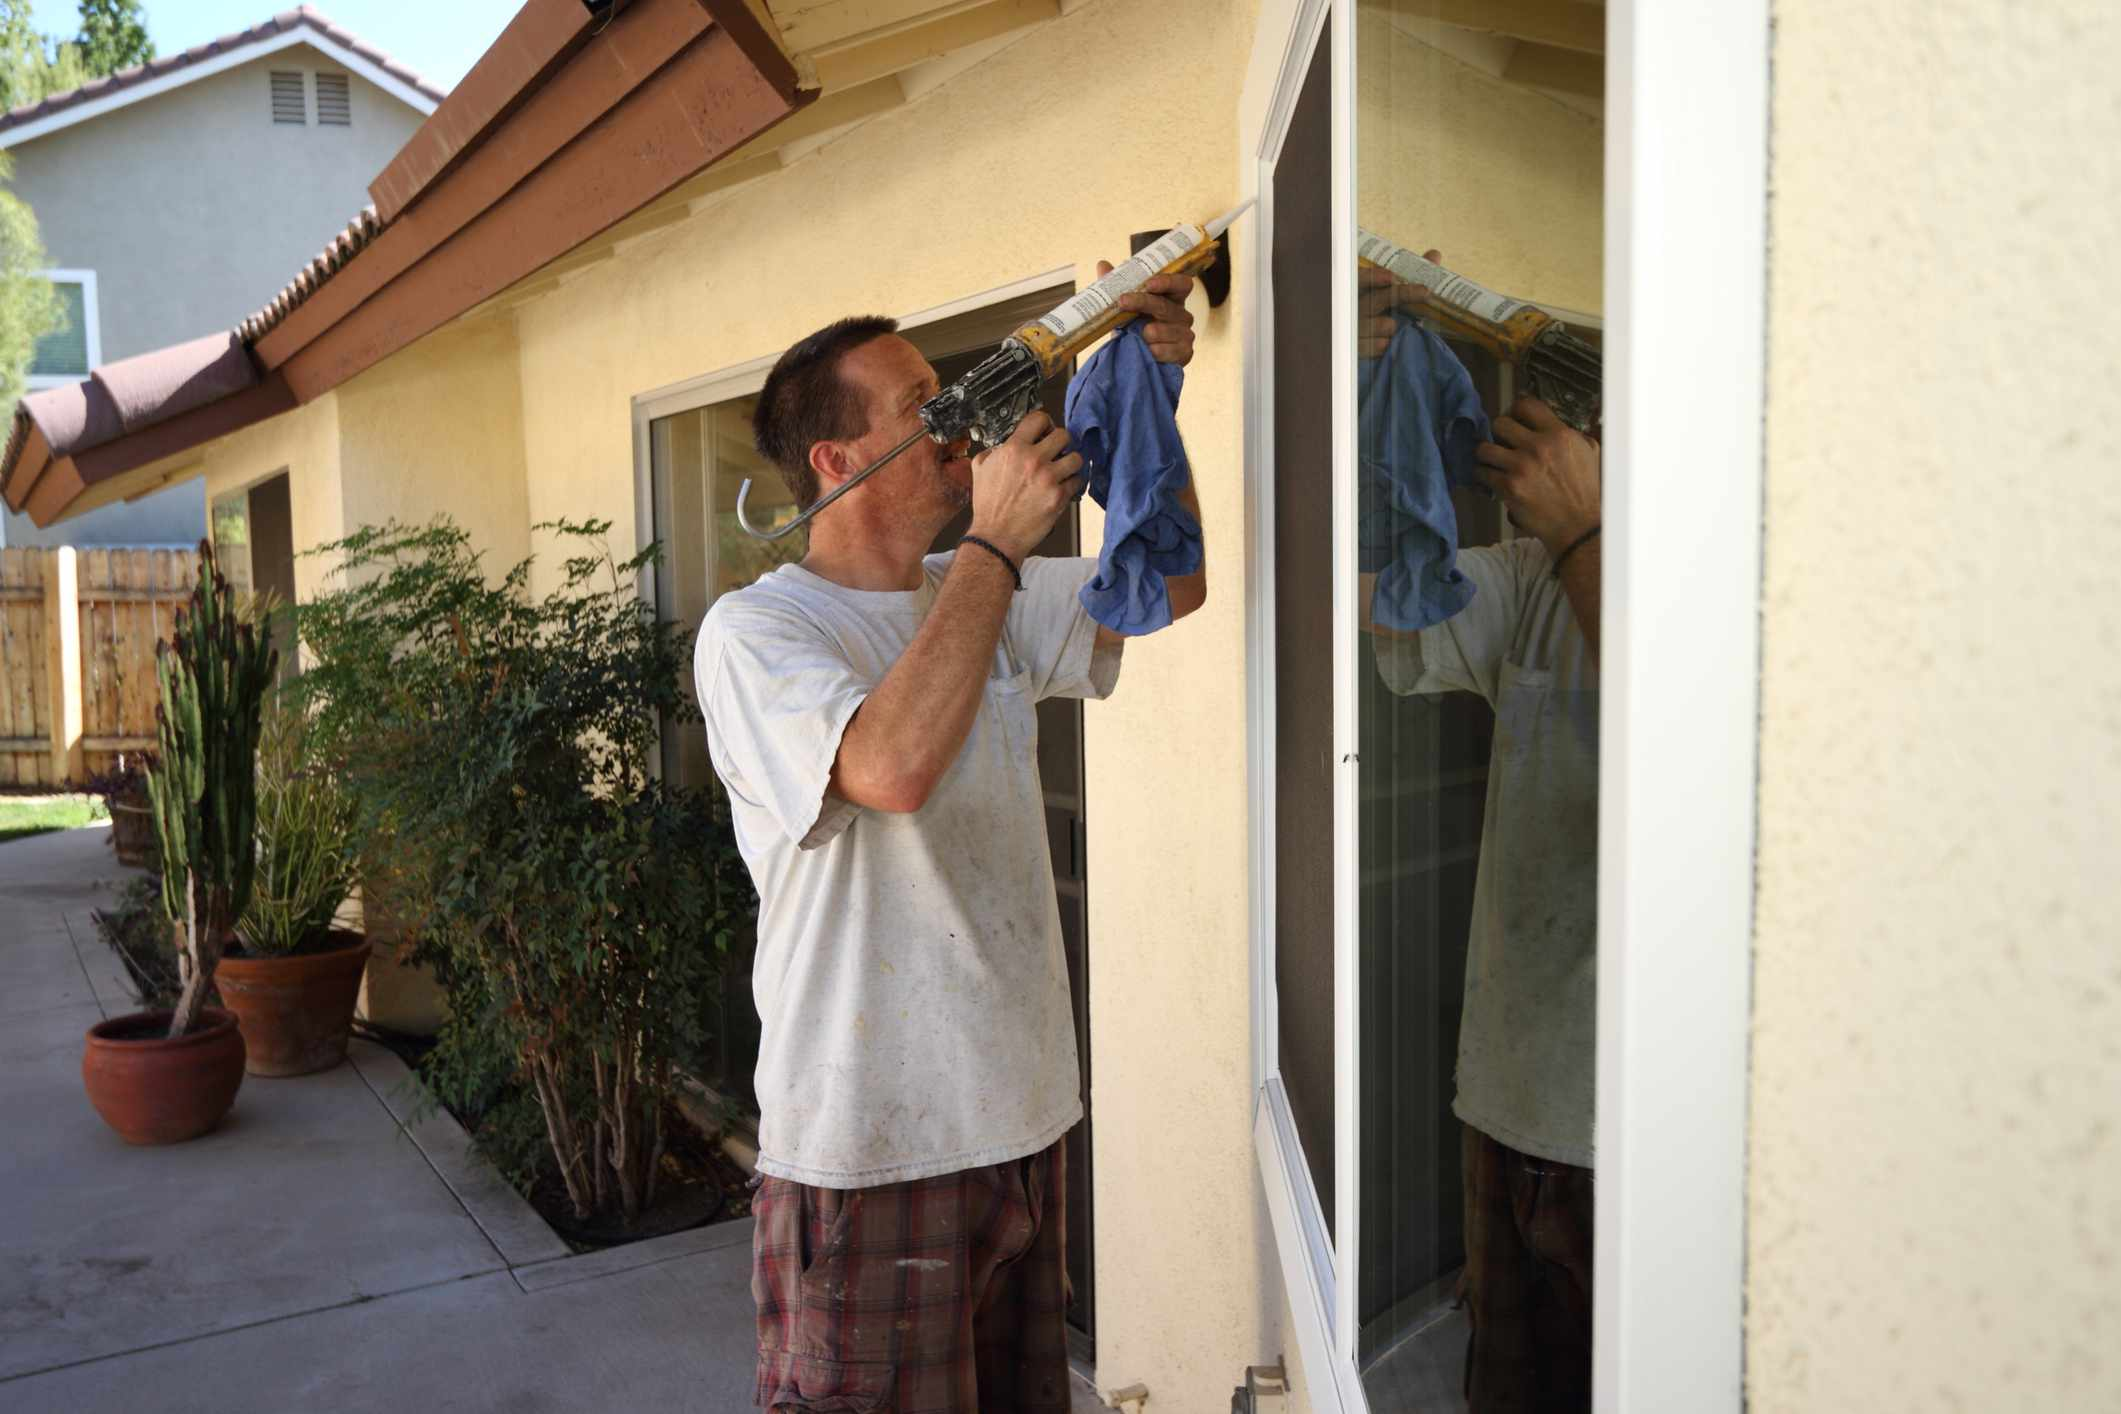 Homeowner using a caulking gun outside